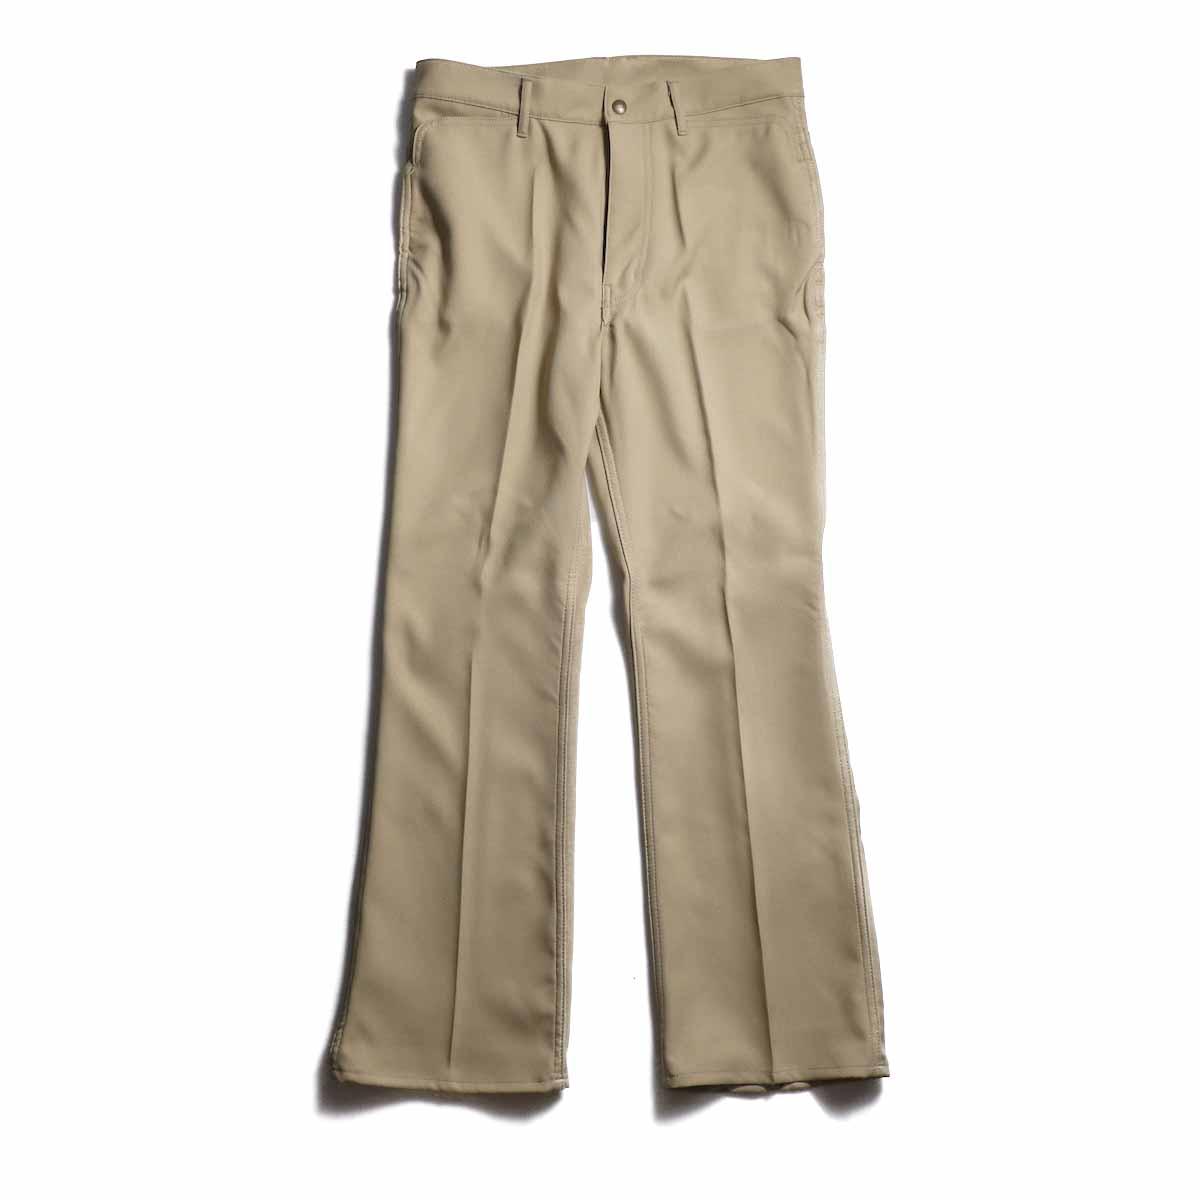 NEEDLES / Boot Cut Jean -Poly Twill (Beige)